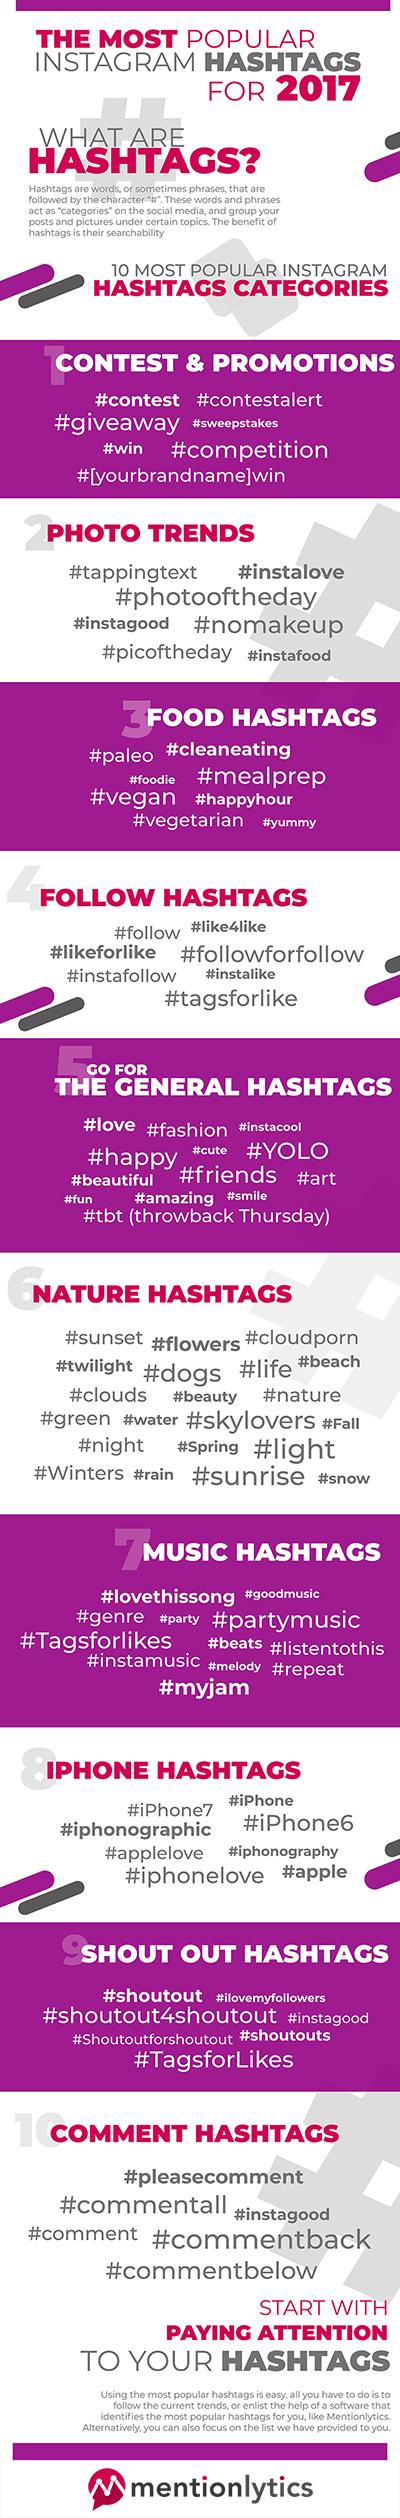 infographic-instagram-hashtags-2017